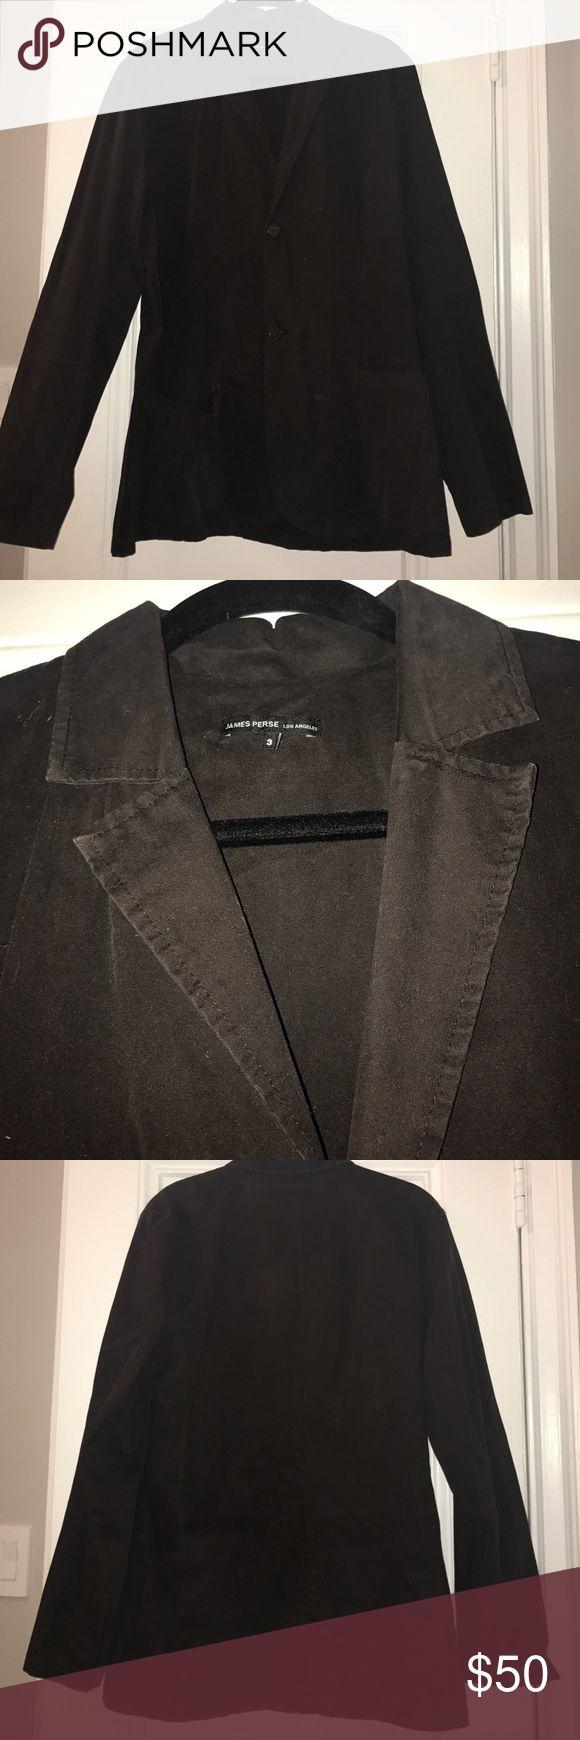 "James Perse ""size 3"" brown cotton blazer James Perse ""size 3"" 2-button no vent chocolate brown cotton blazer James Perse Suits & Blazers Sport Coats & Blazers"